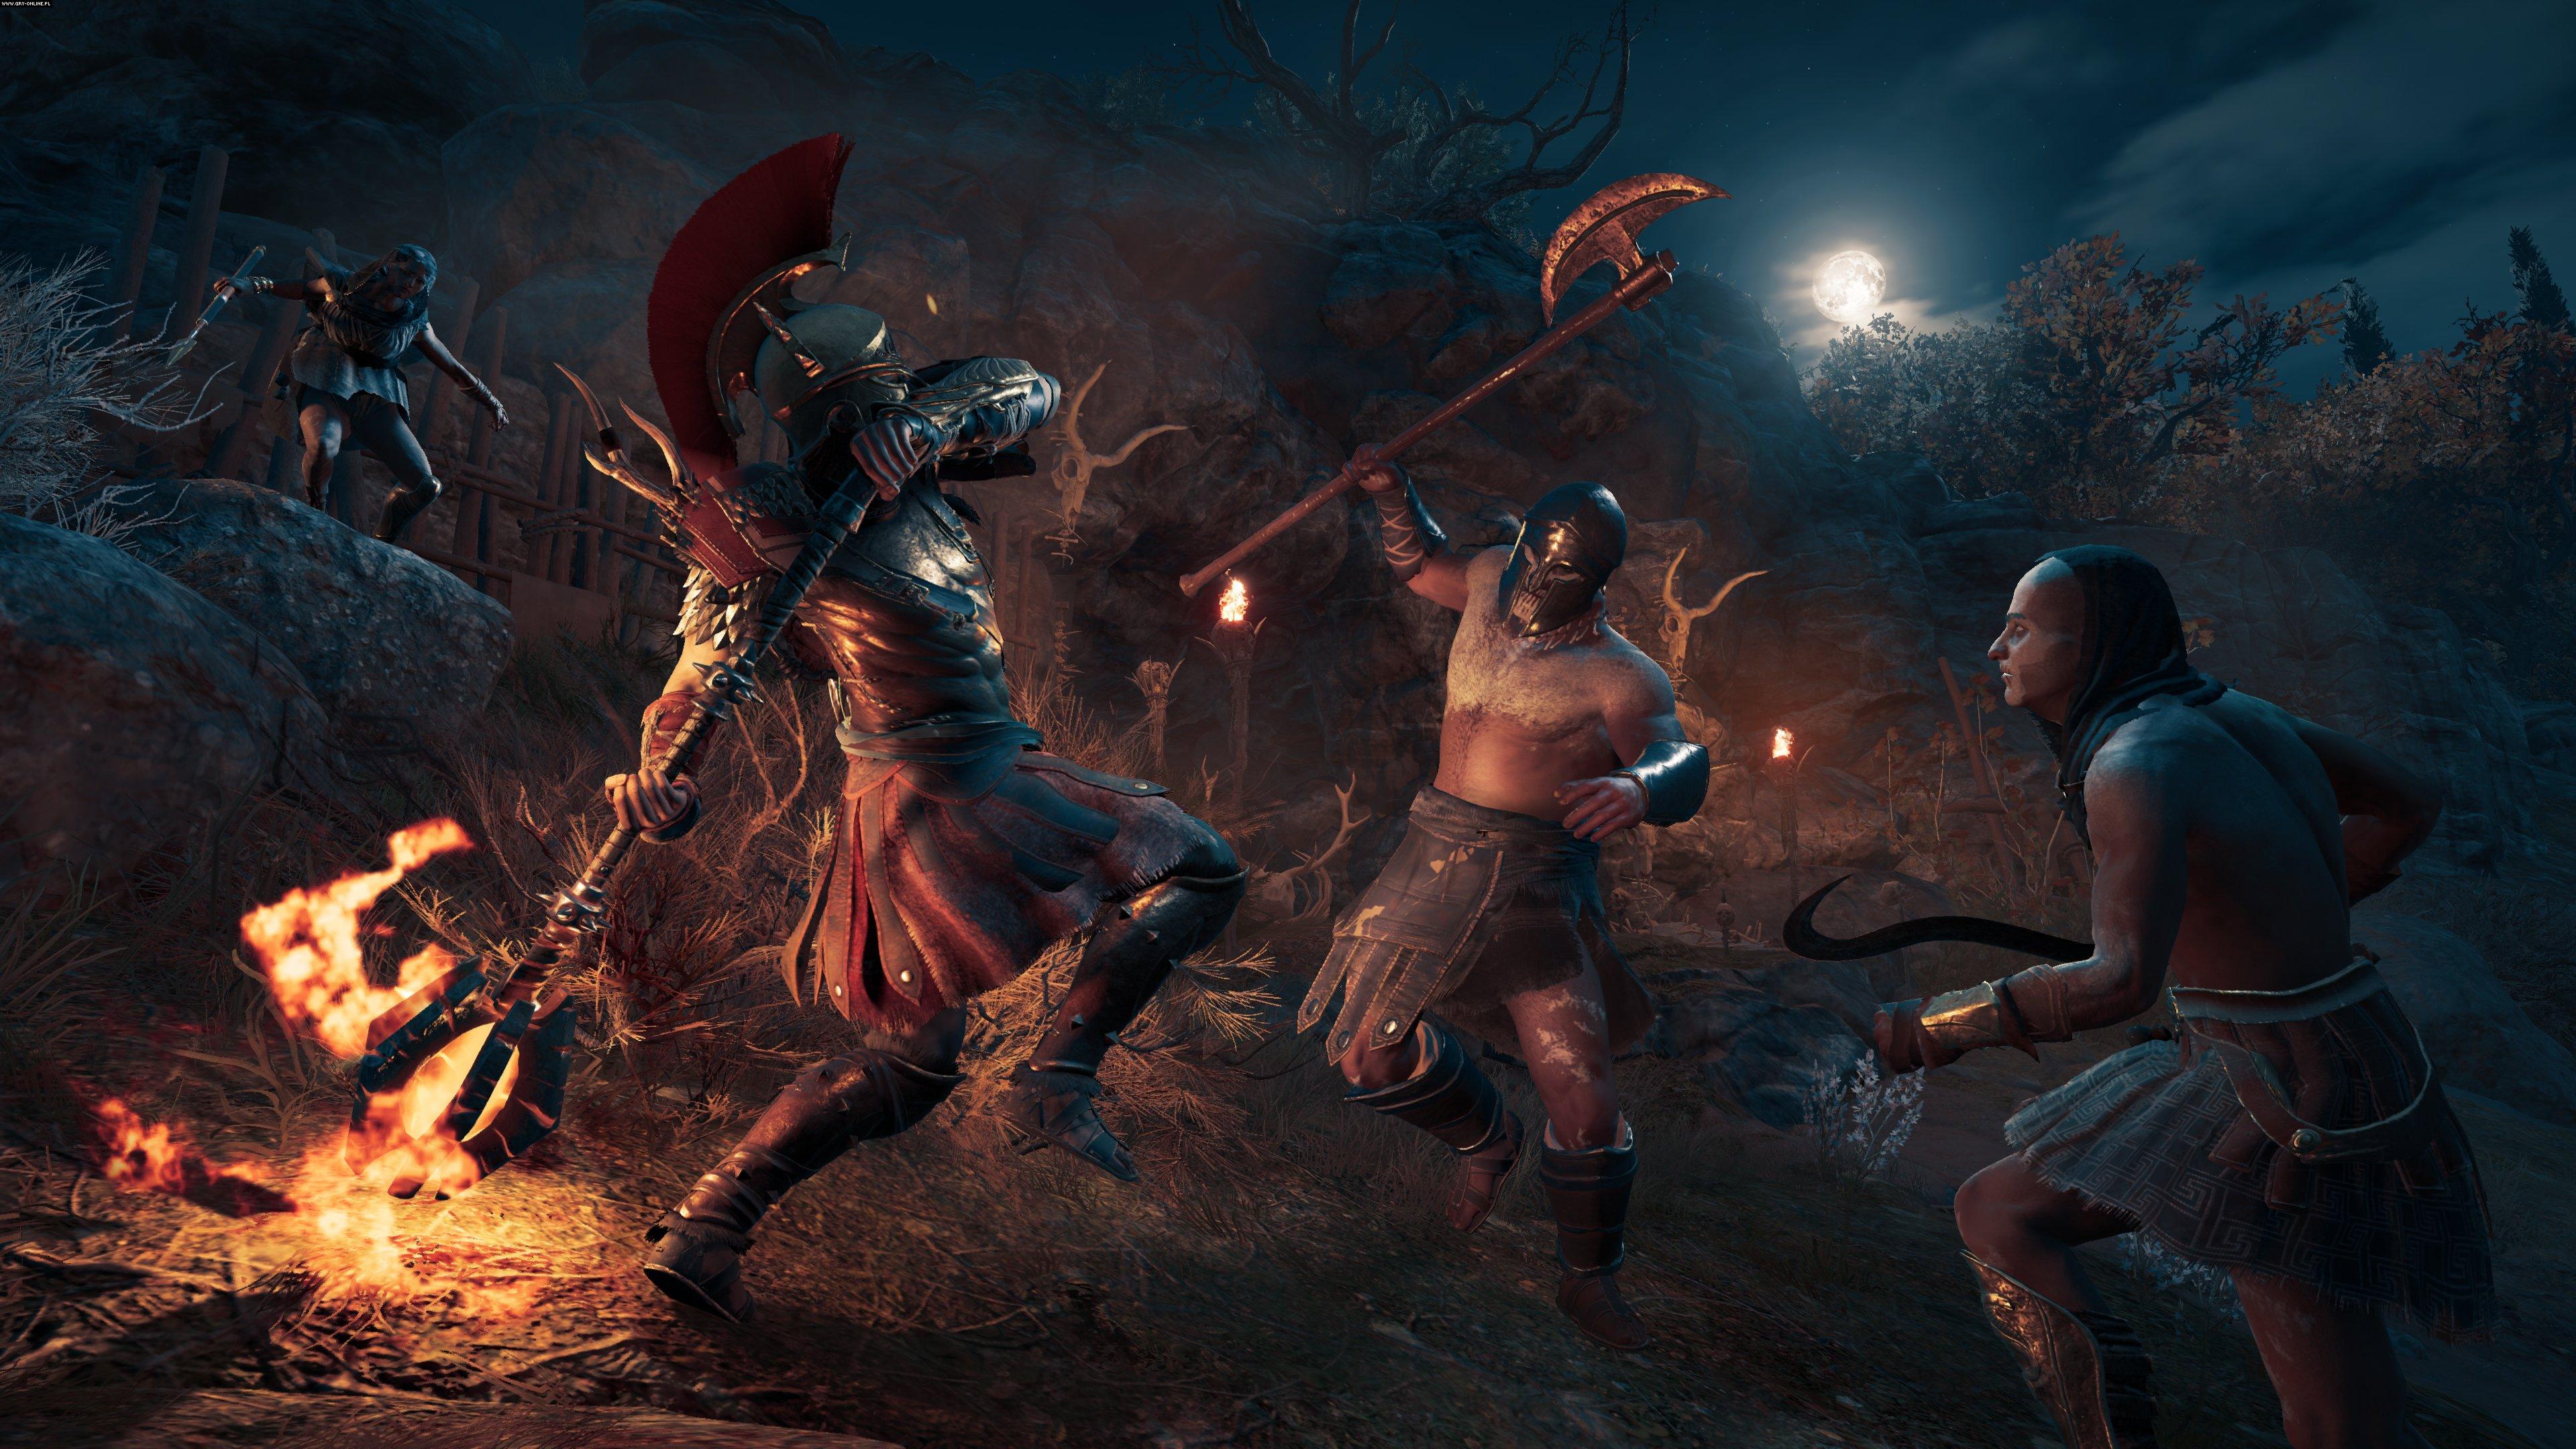 Assassin's Creed Odyssey PC, PS4, XONE Games Image 14/47, Ubisoft